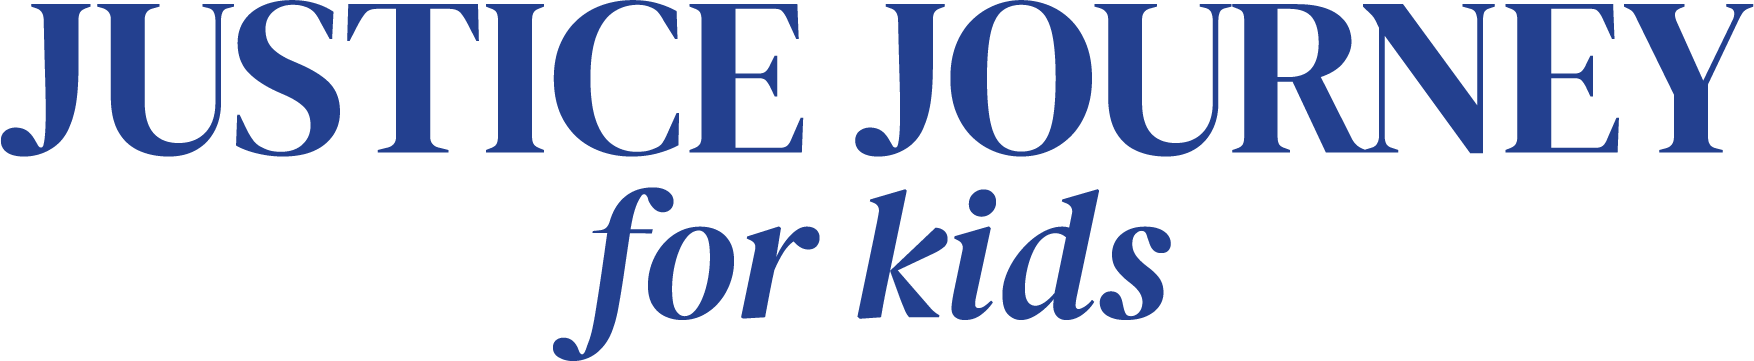 JusticeJourney kids text_OL